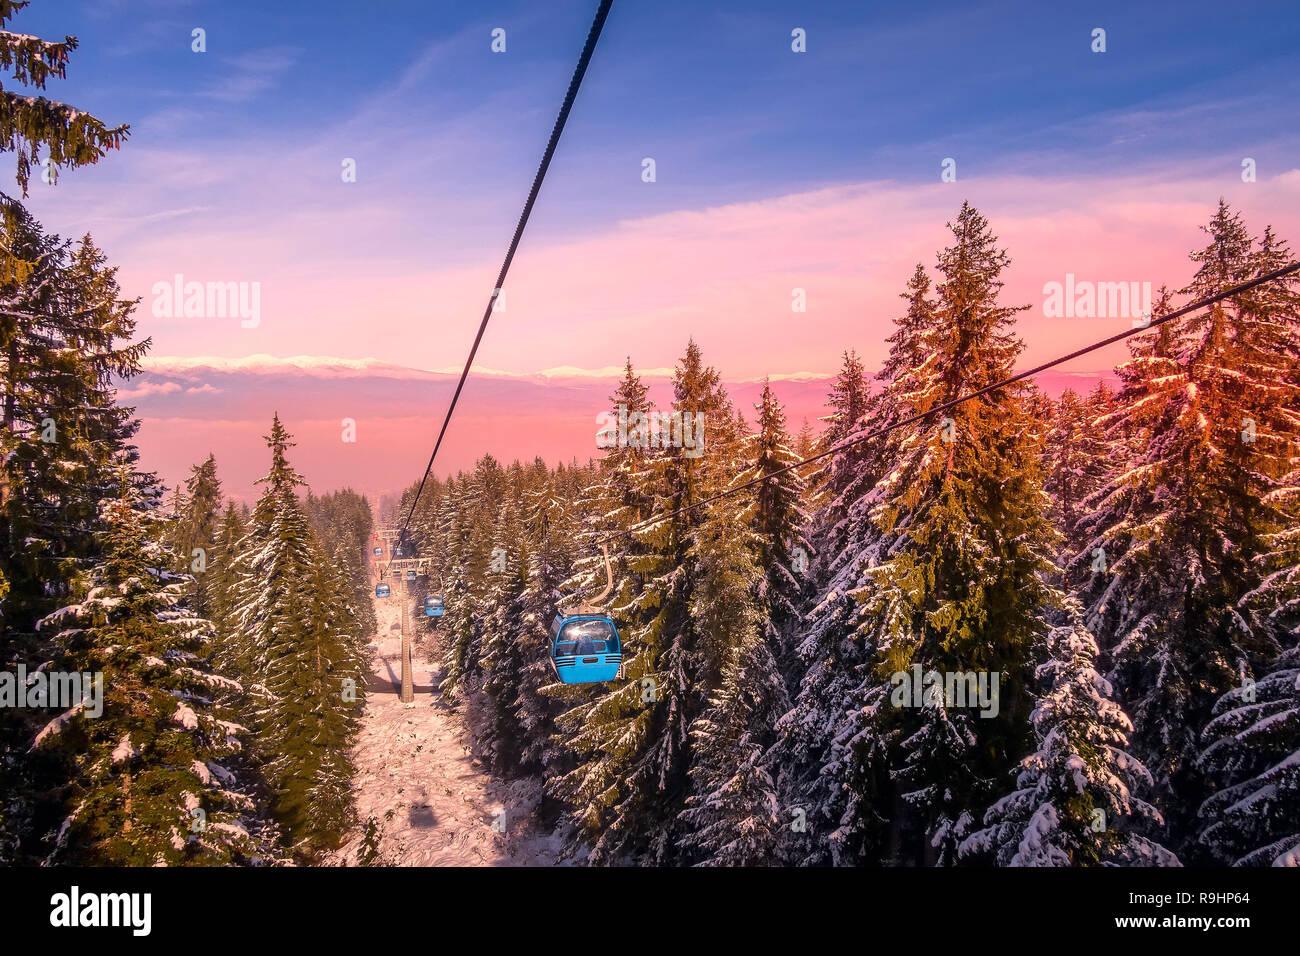 Bansko Bulgaria Winter Ski Resort Pink Sunset View Lift